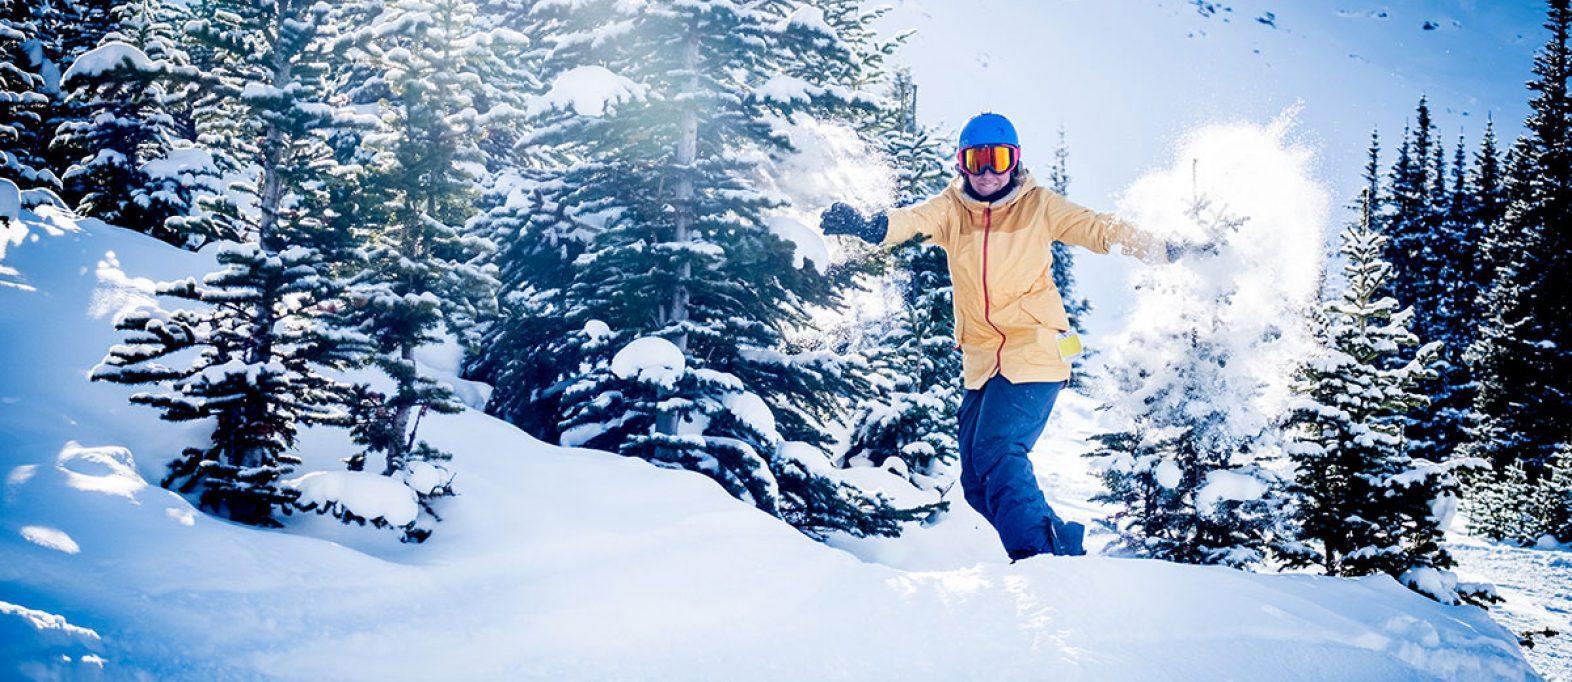 Skifahren in den Rocky Mountains (Kanada)